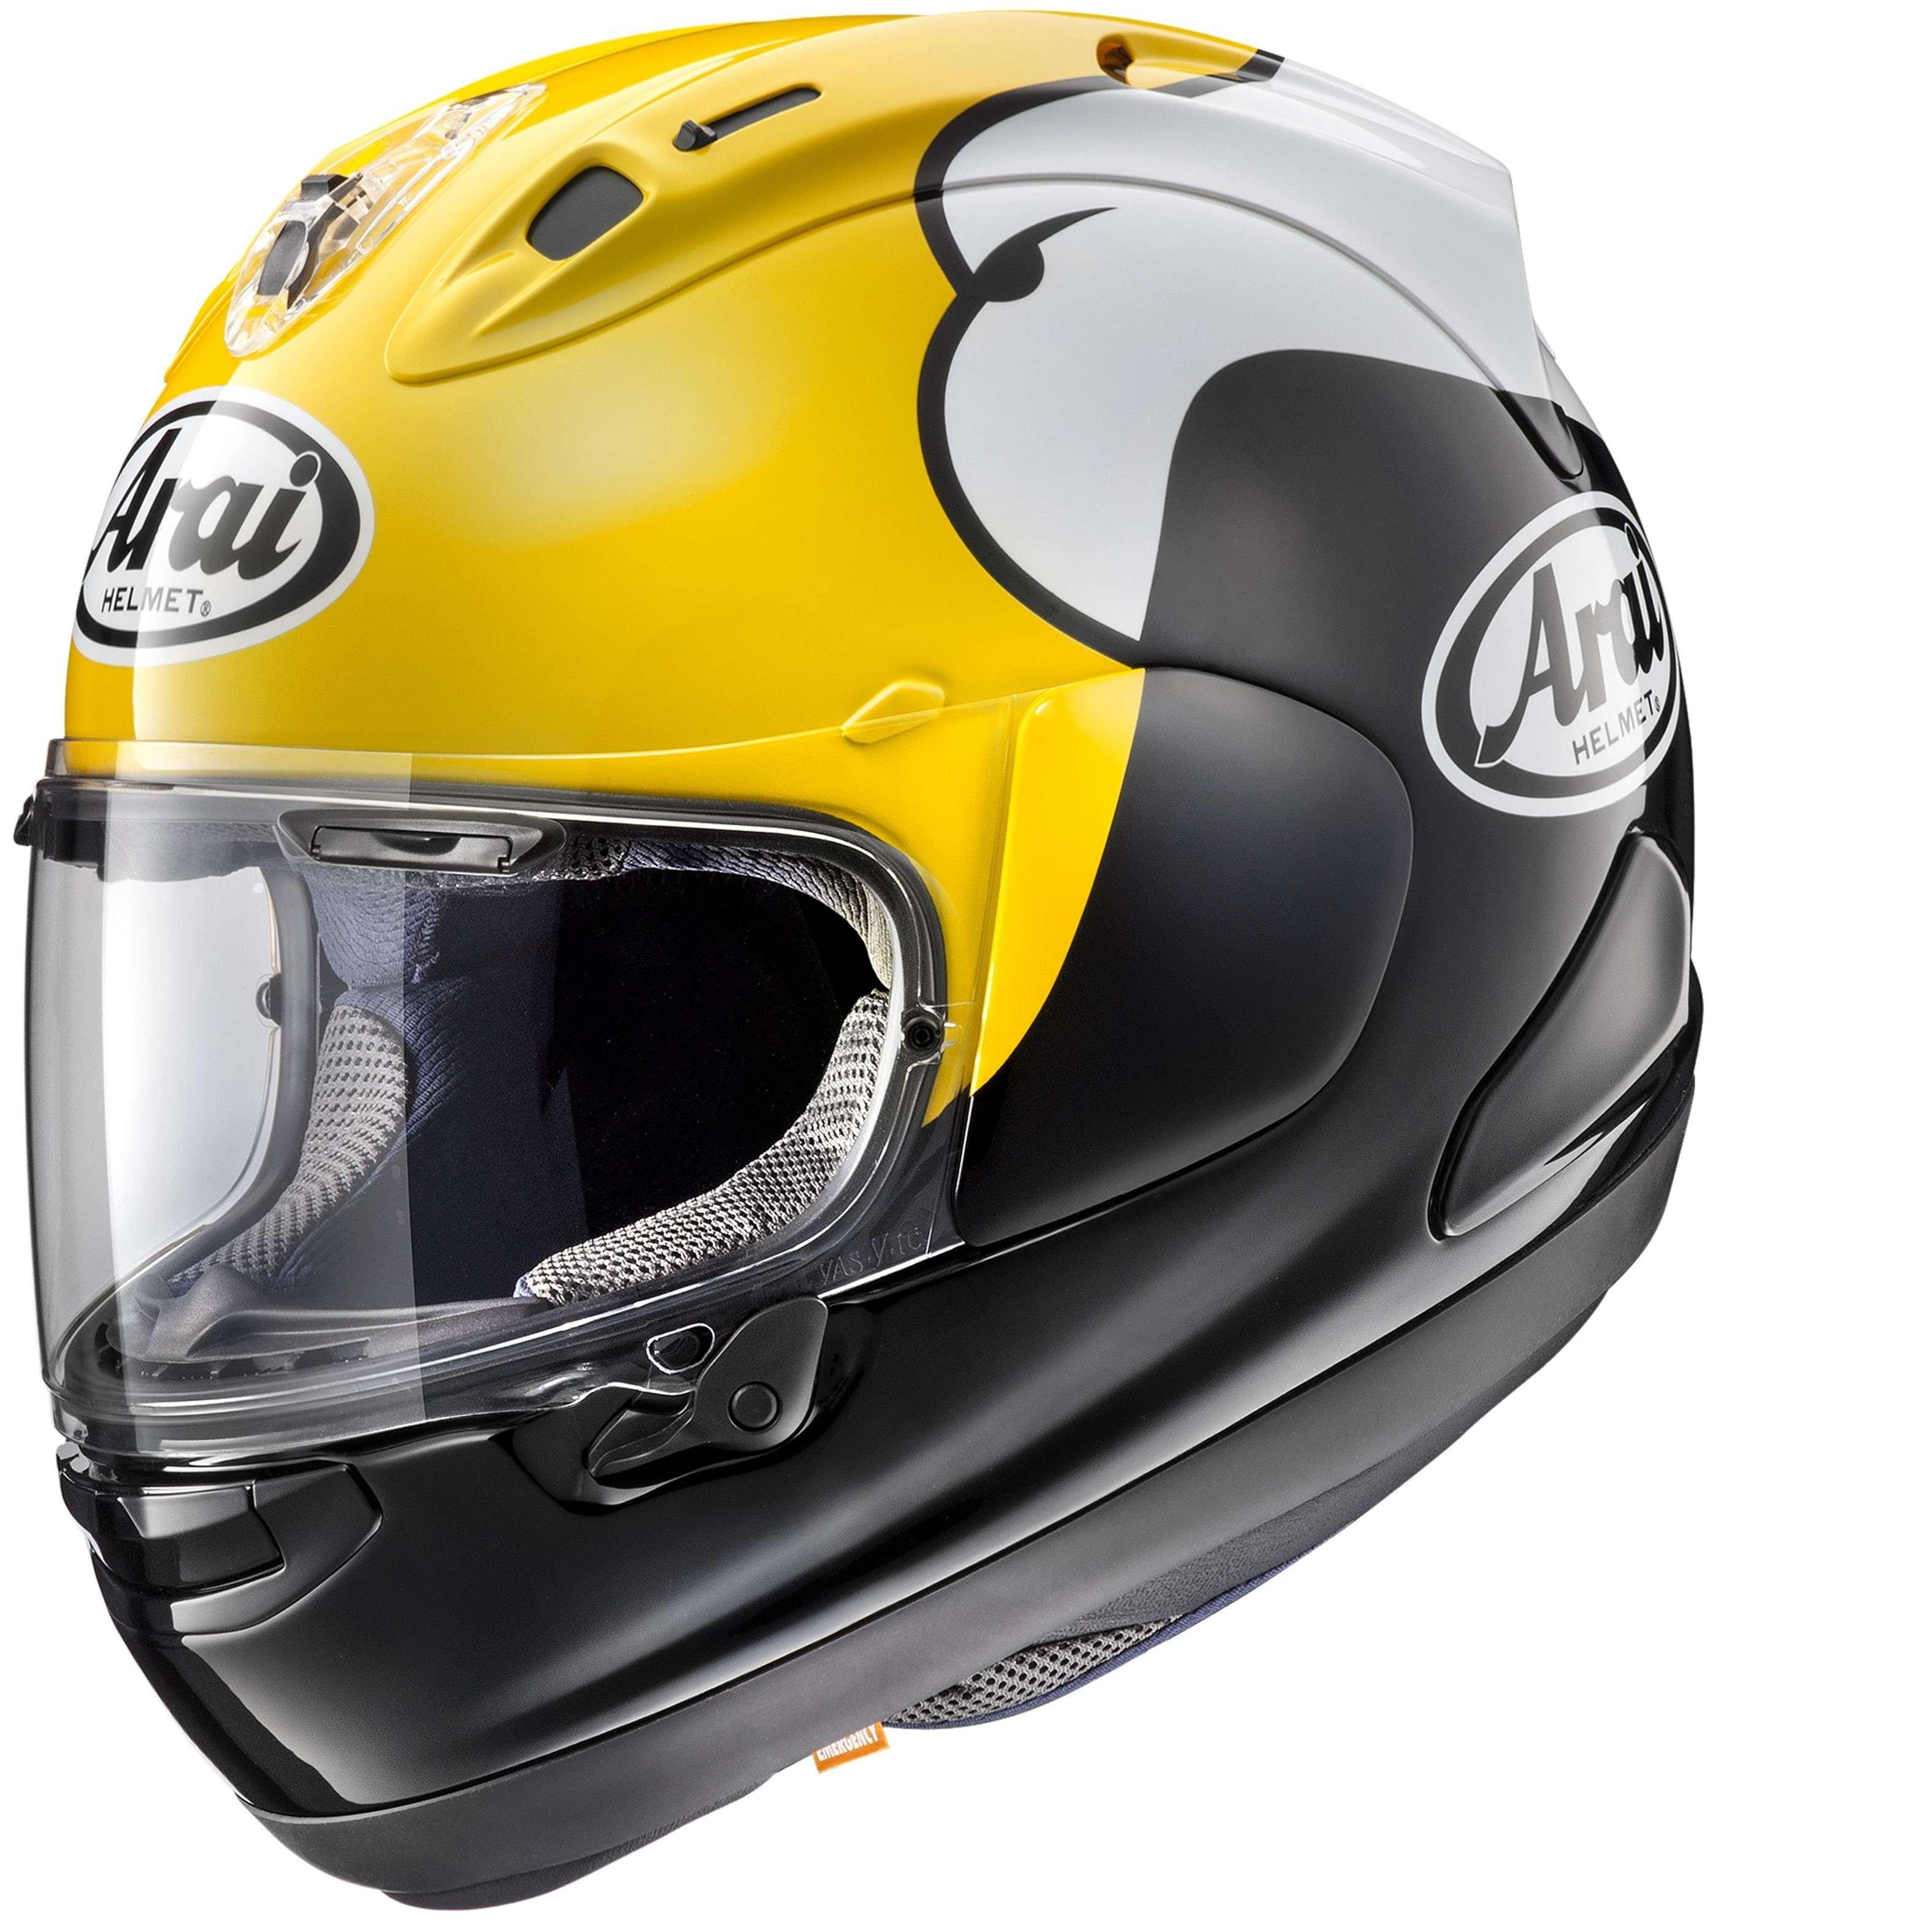 arai rx 7v full face race motorcycle replica helmet kenny roberts yamaha yellow ebay. Black Bedroom Furniture Sets. Home Design Ideas